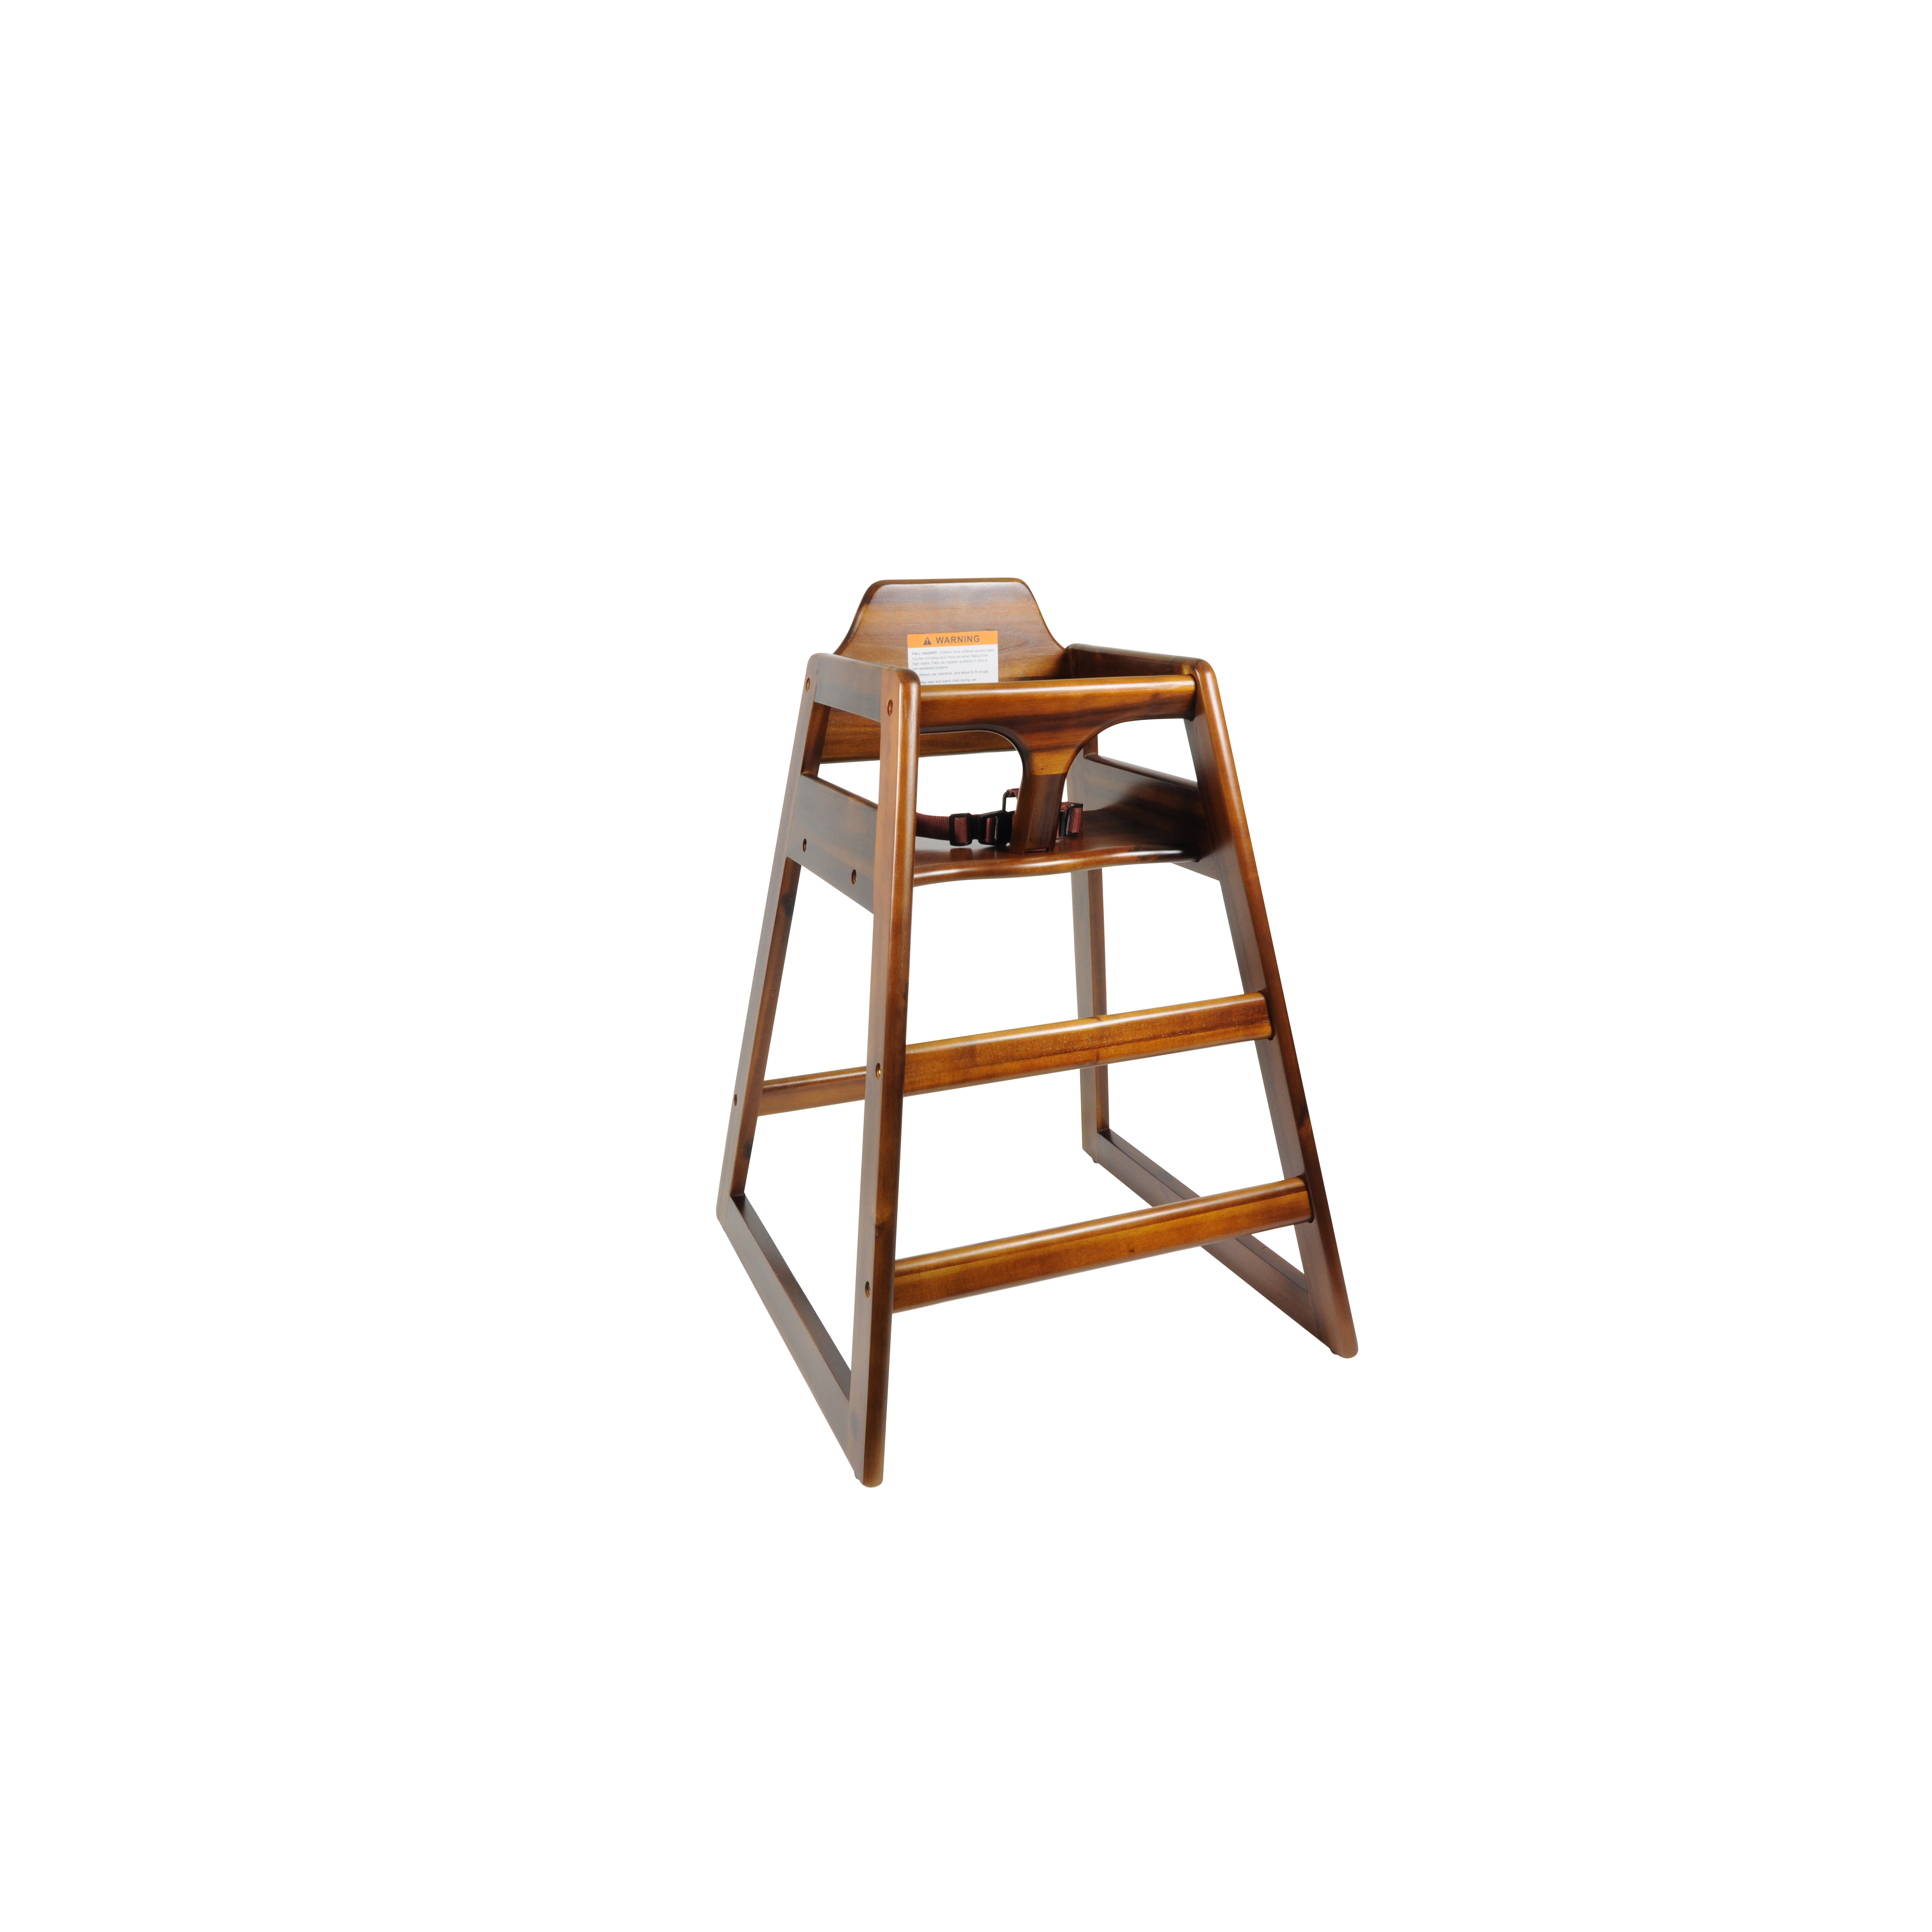 Thunder Group WDTHHC019A high chair, wood